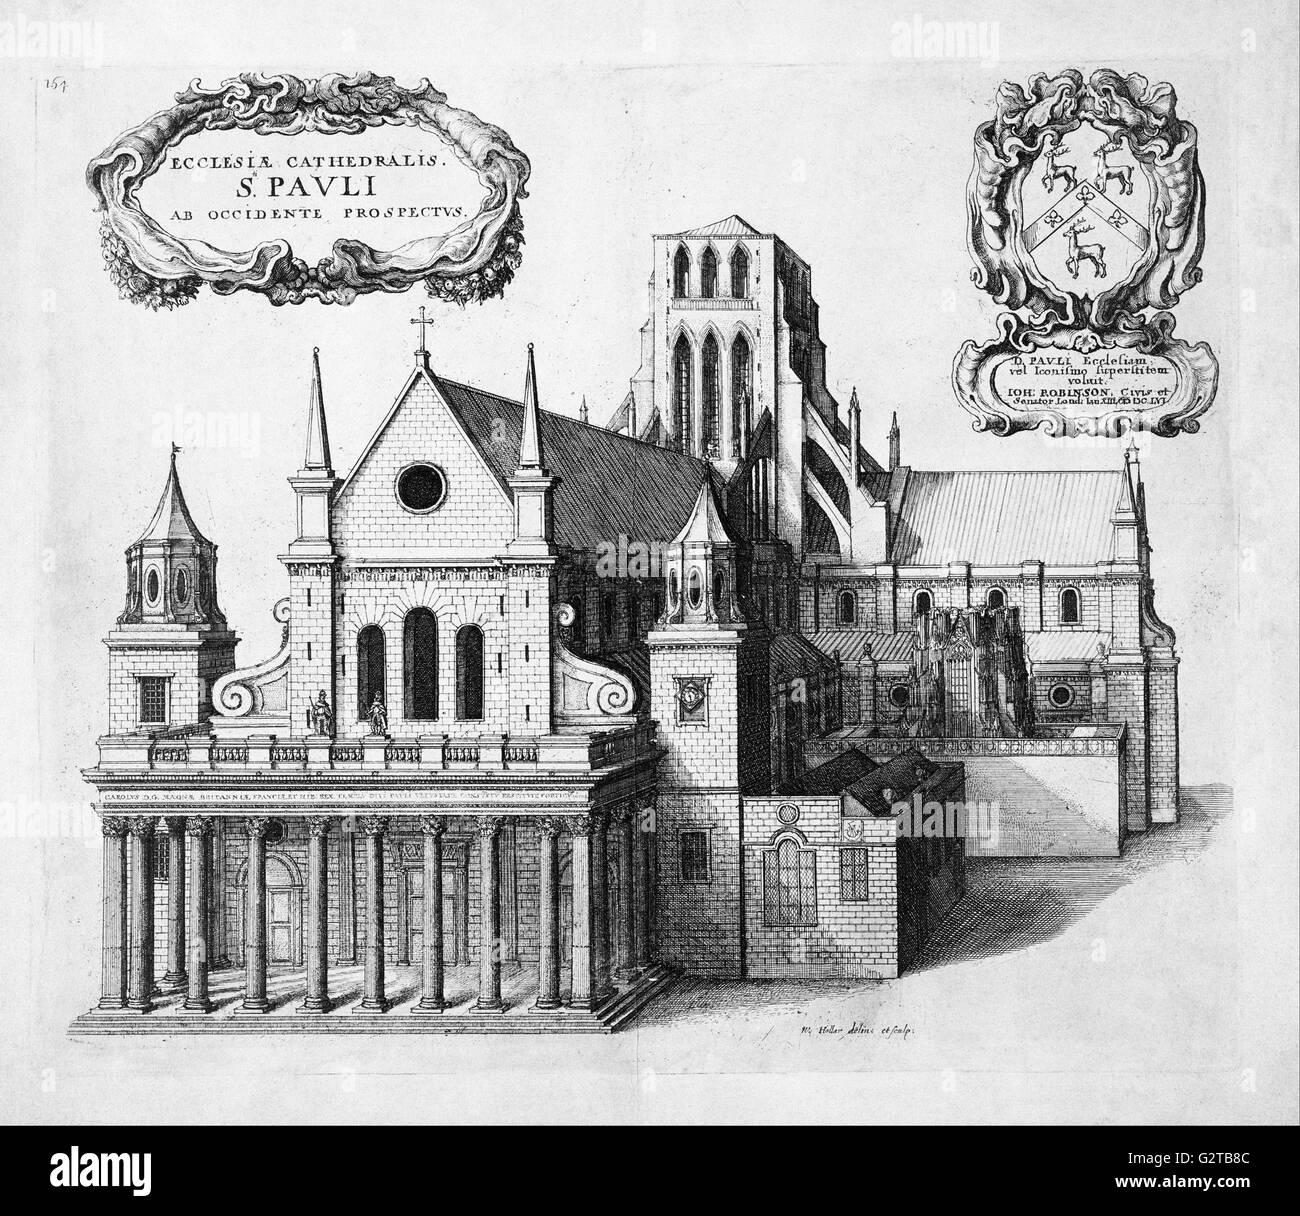 Grite, Wenceslao - impresión; aguafuerte - St Paul's desde el oeste - Imagen De Stock